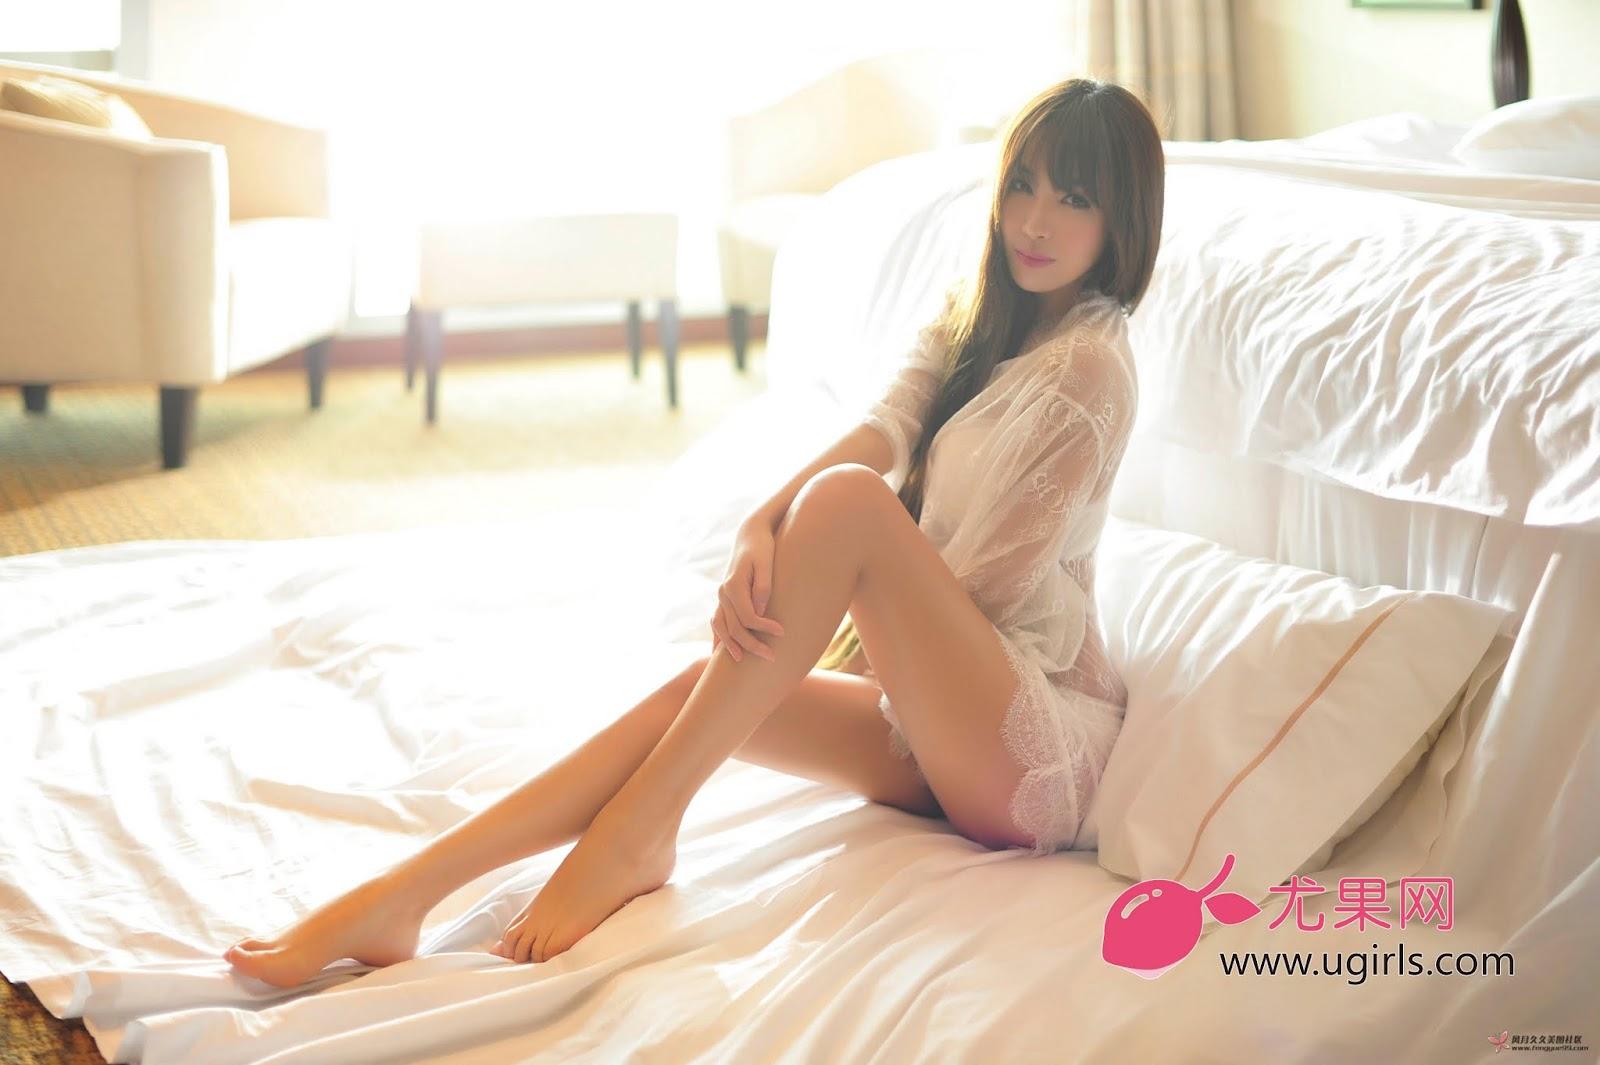 DLS 4553 - Hot Girl Model UGIRLS NO.13